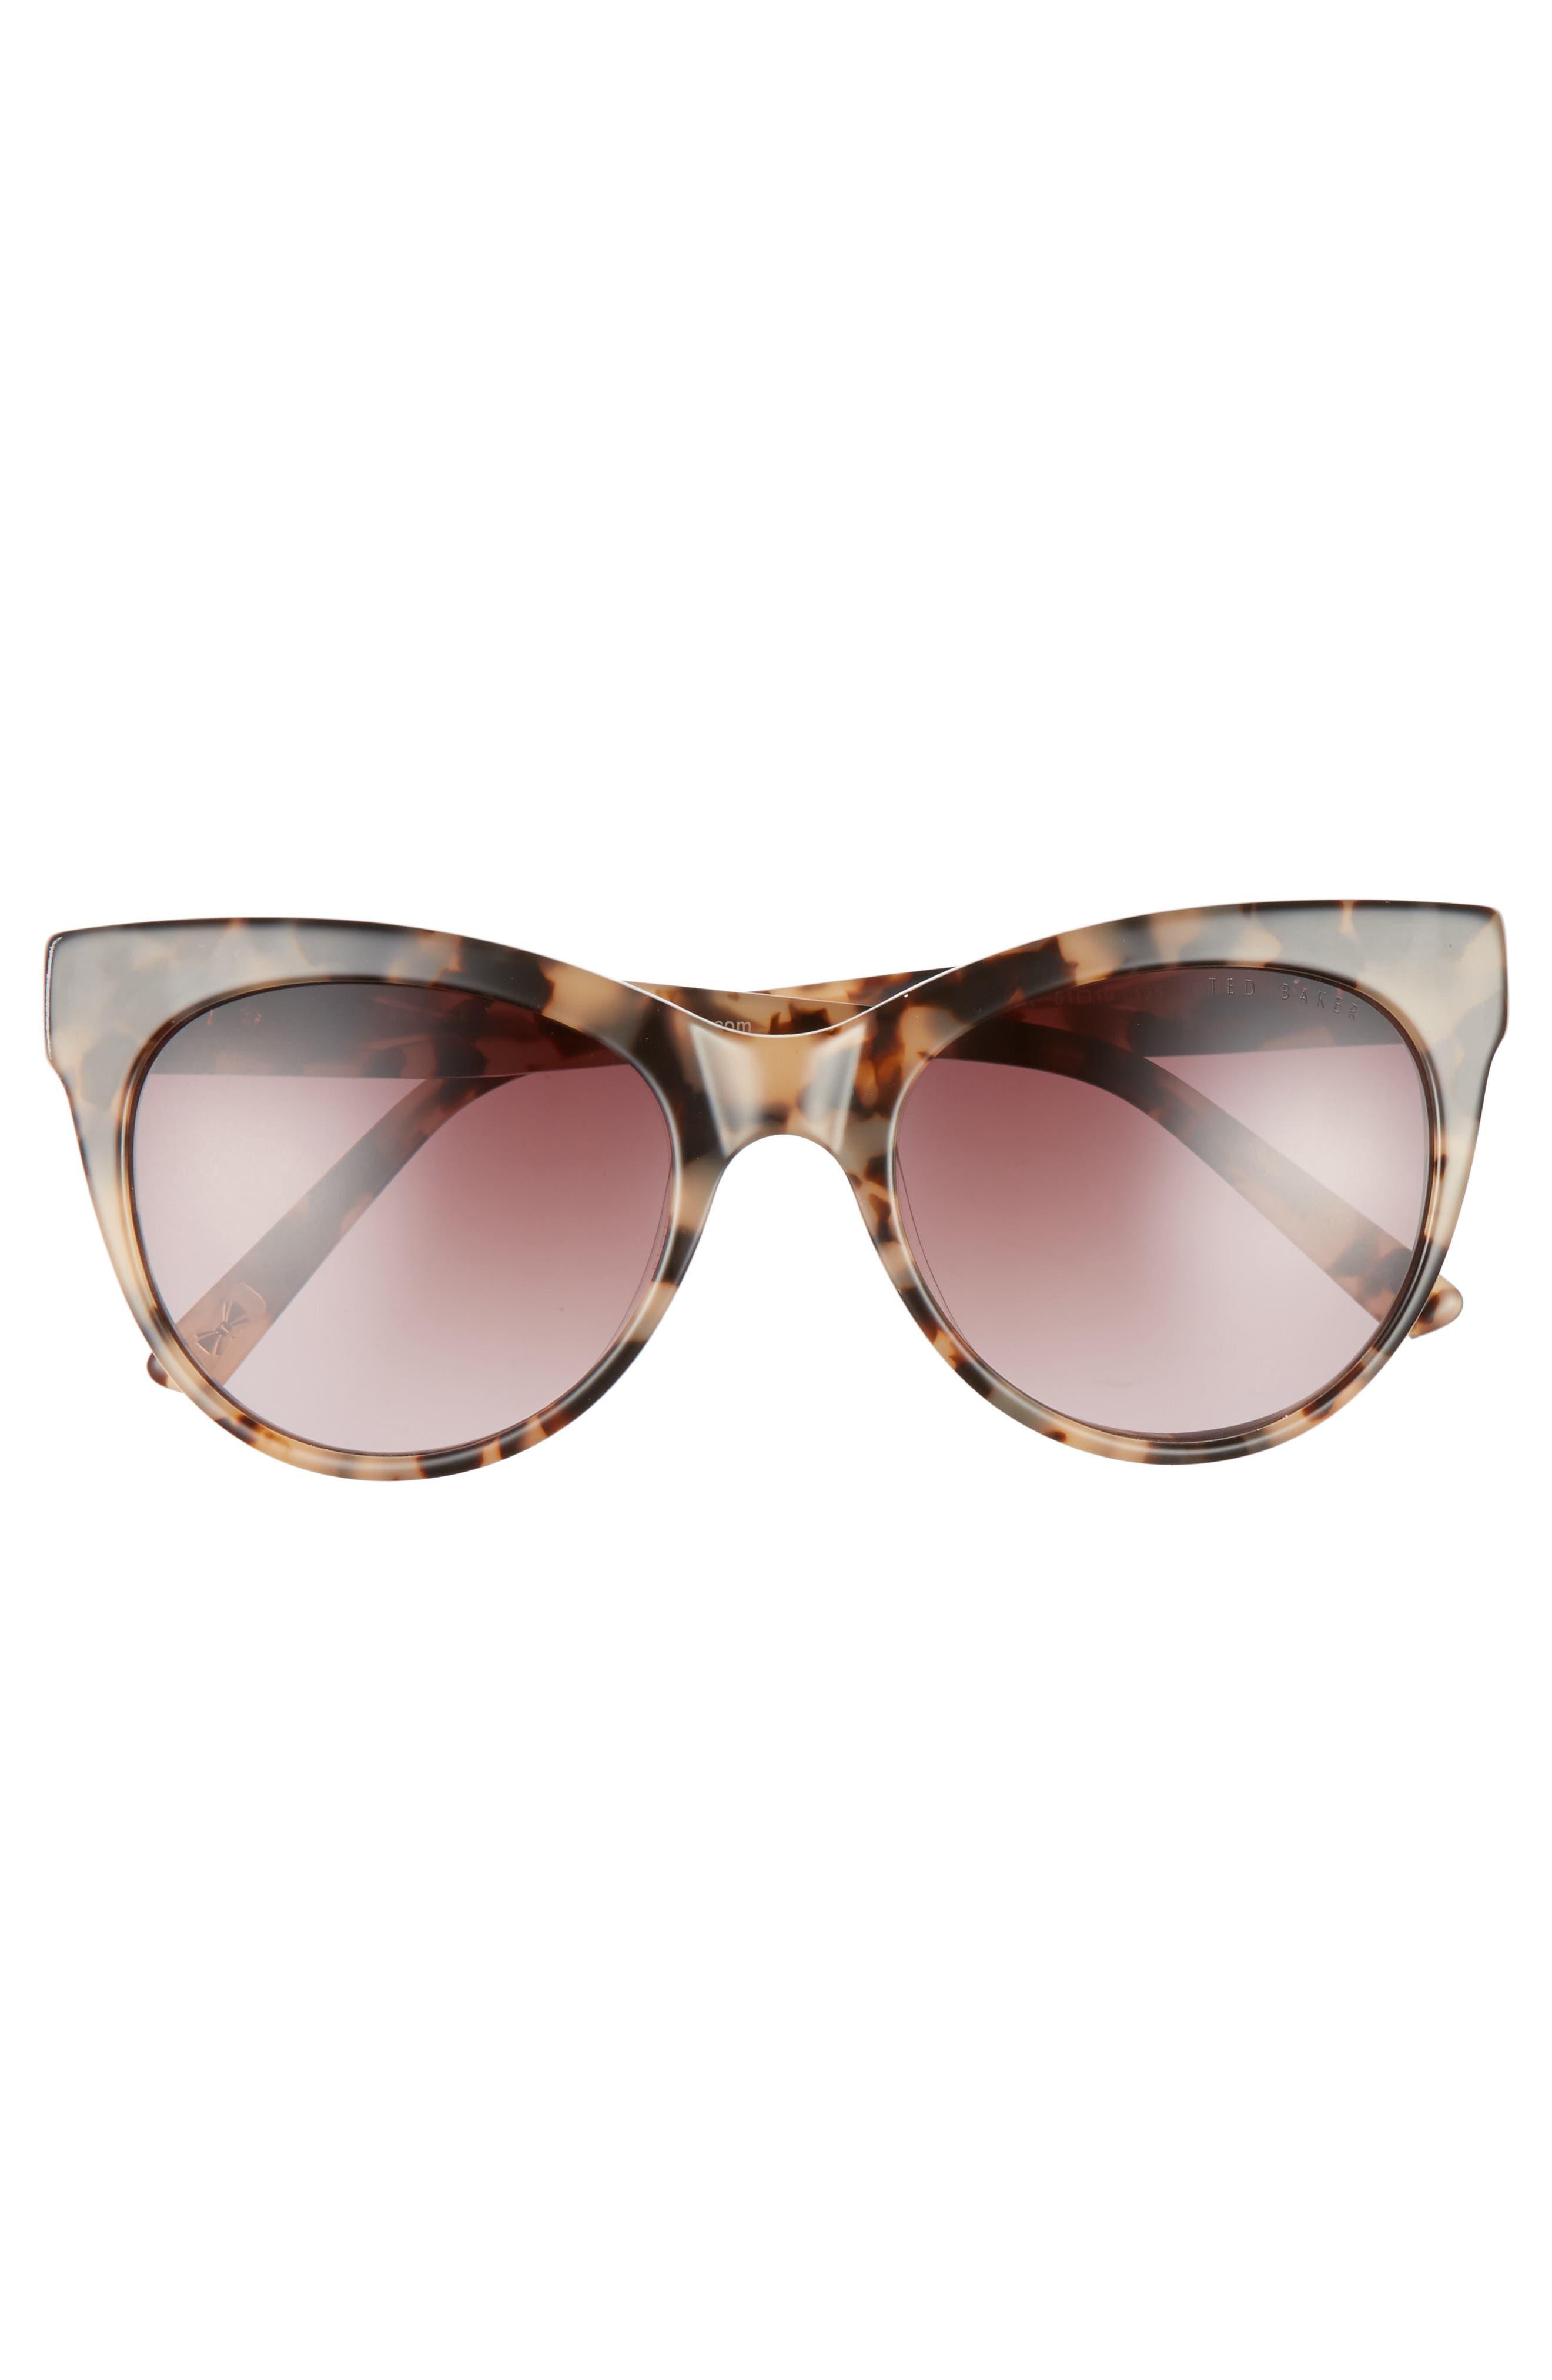 51mm Cat Eye Sunglasses,                             Alternate thumbnail 6, color,